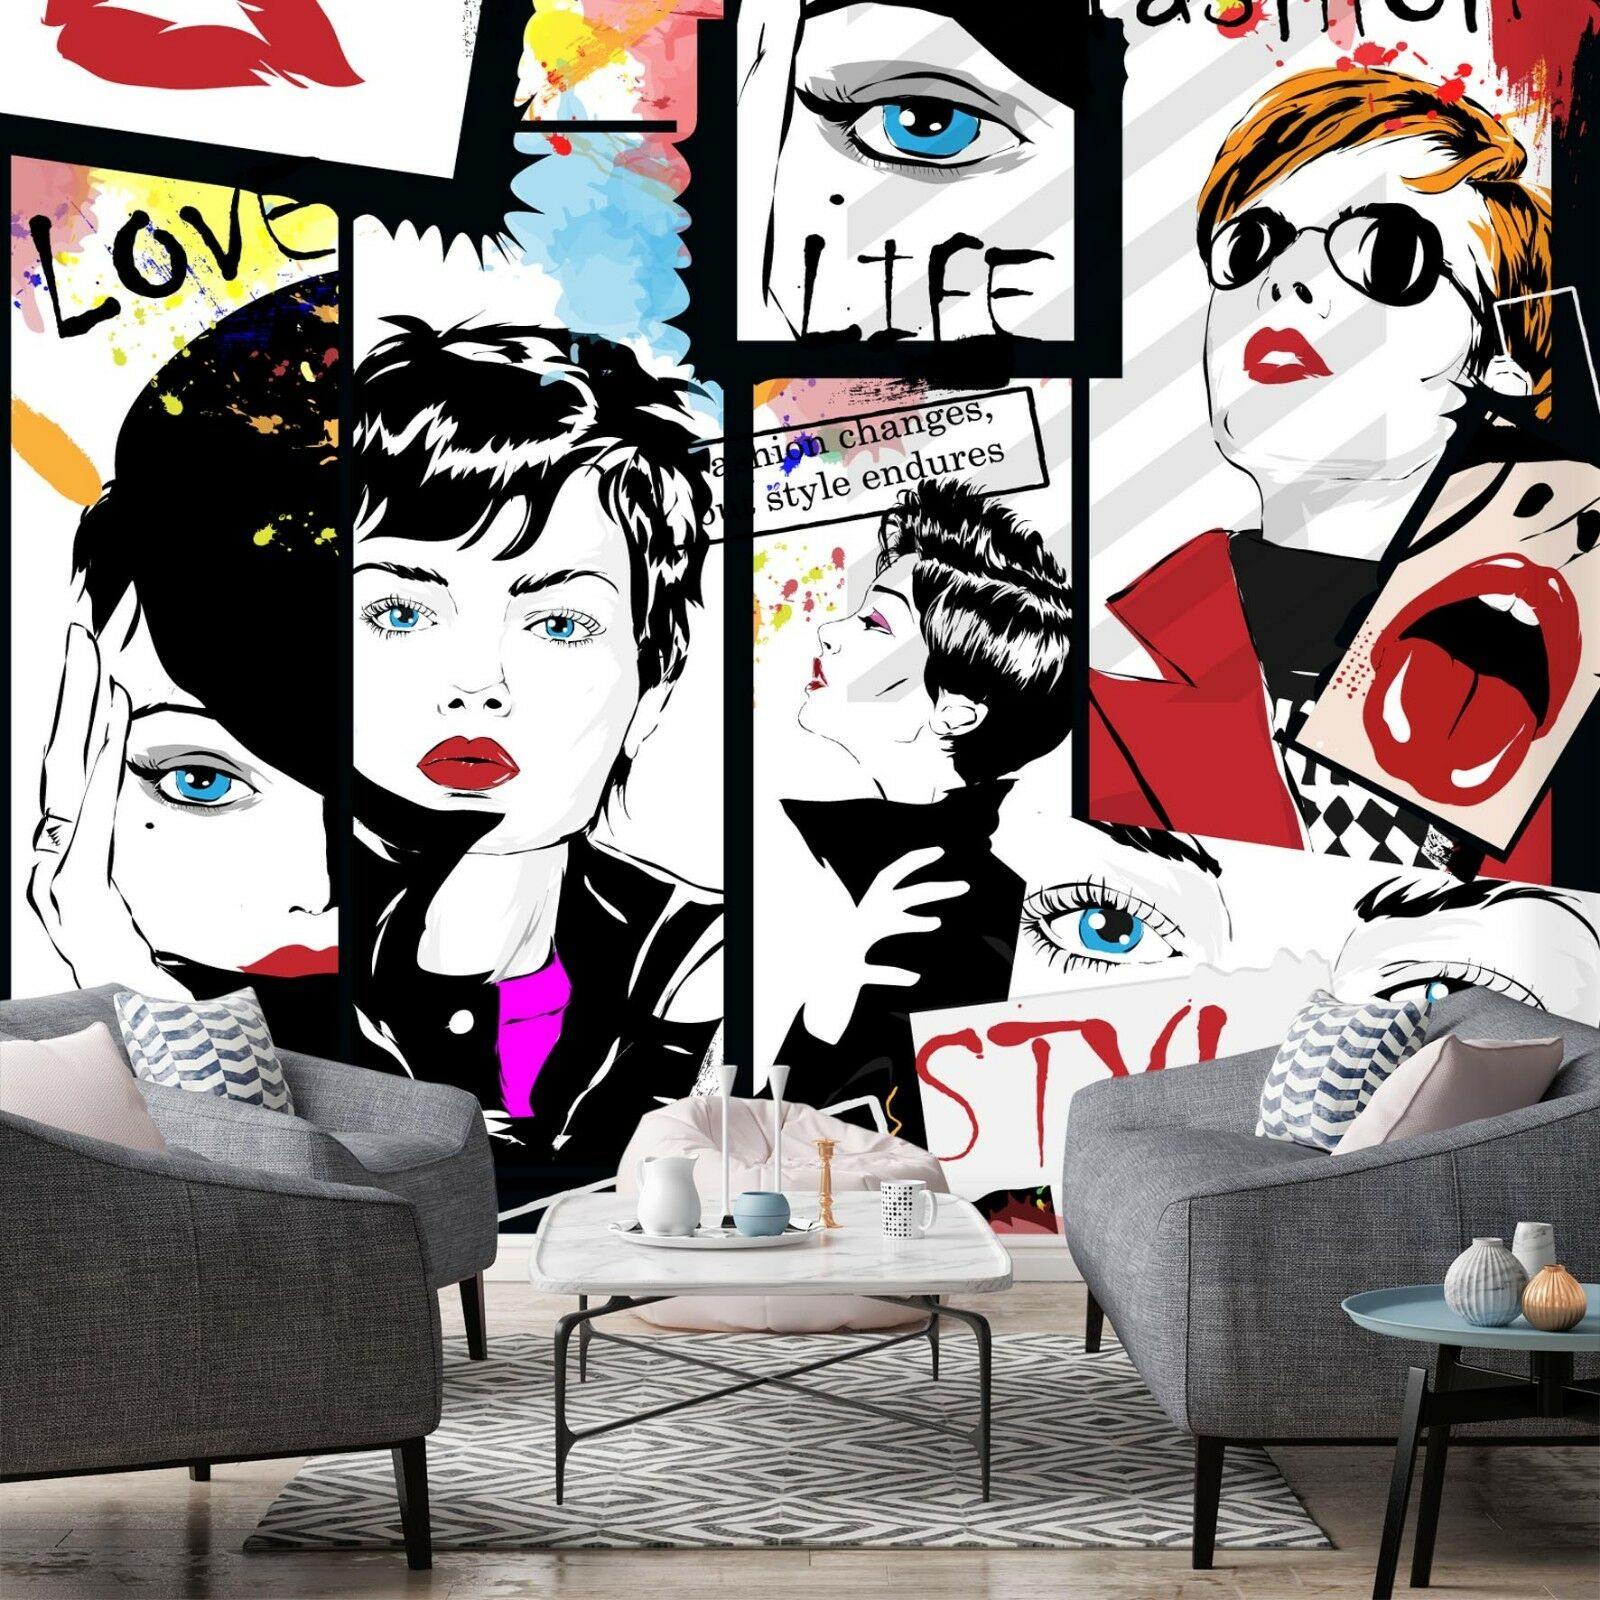 3D Face Girl 7040 Wall Paper Print Wall Decal Deco Indoor Wall Murals US Summer